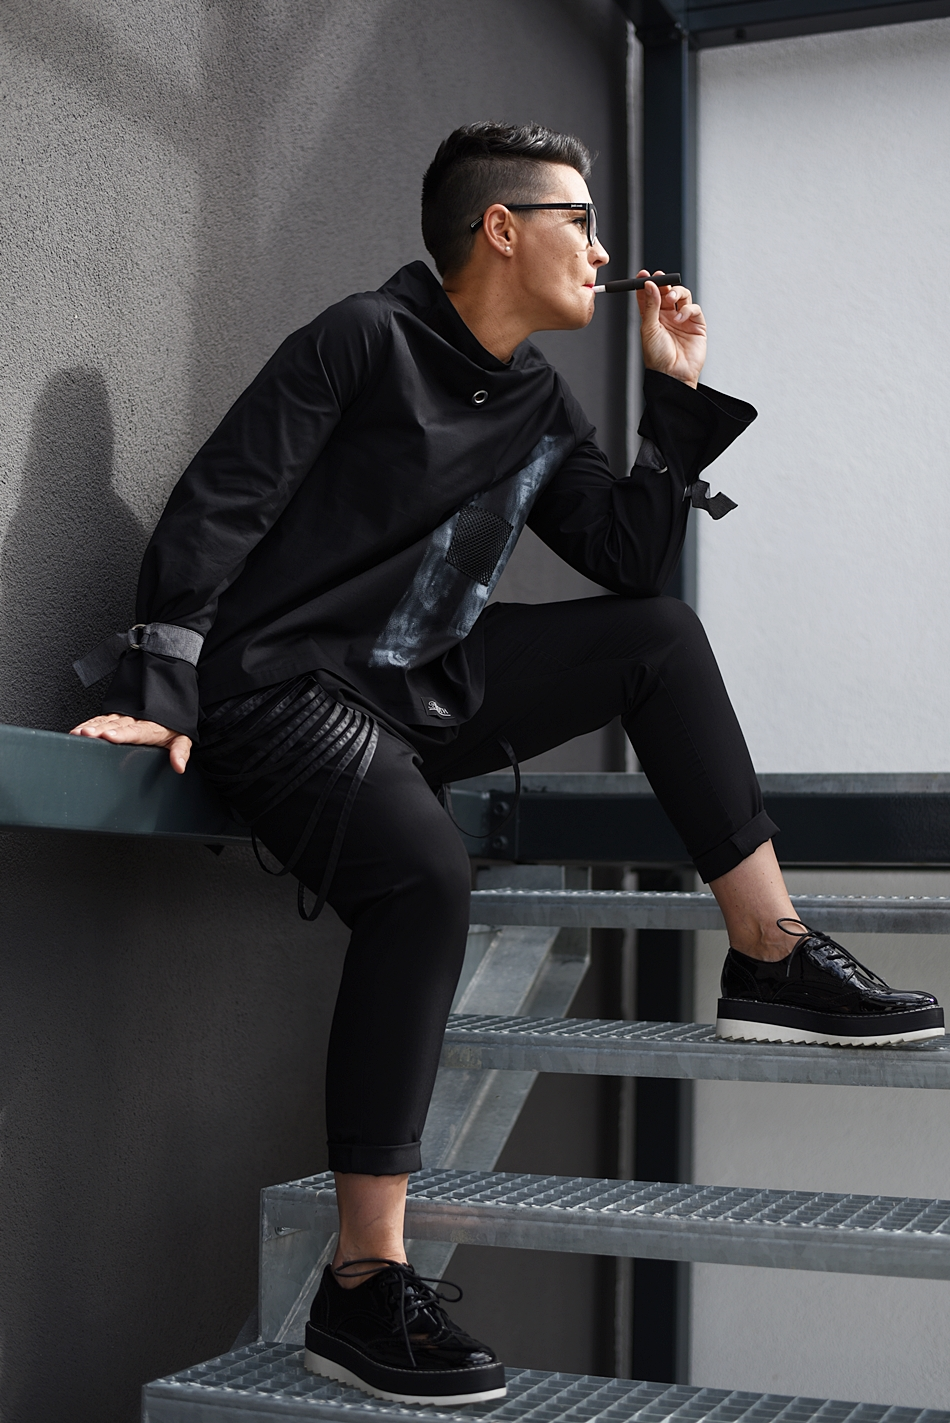 Broth_design_clothes_026